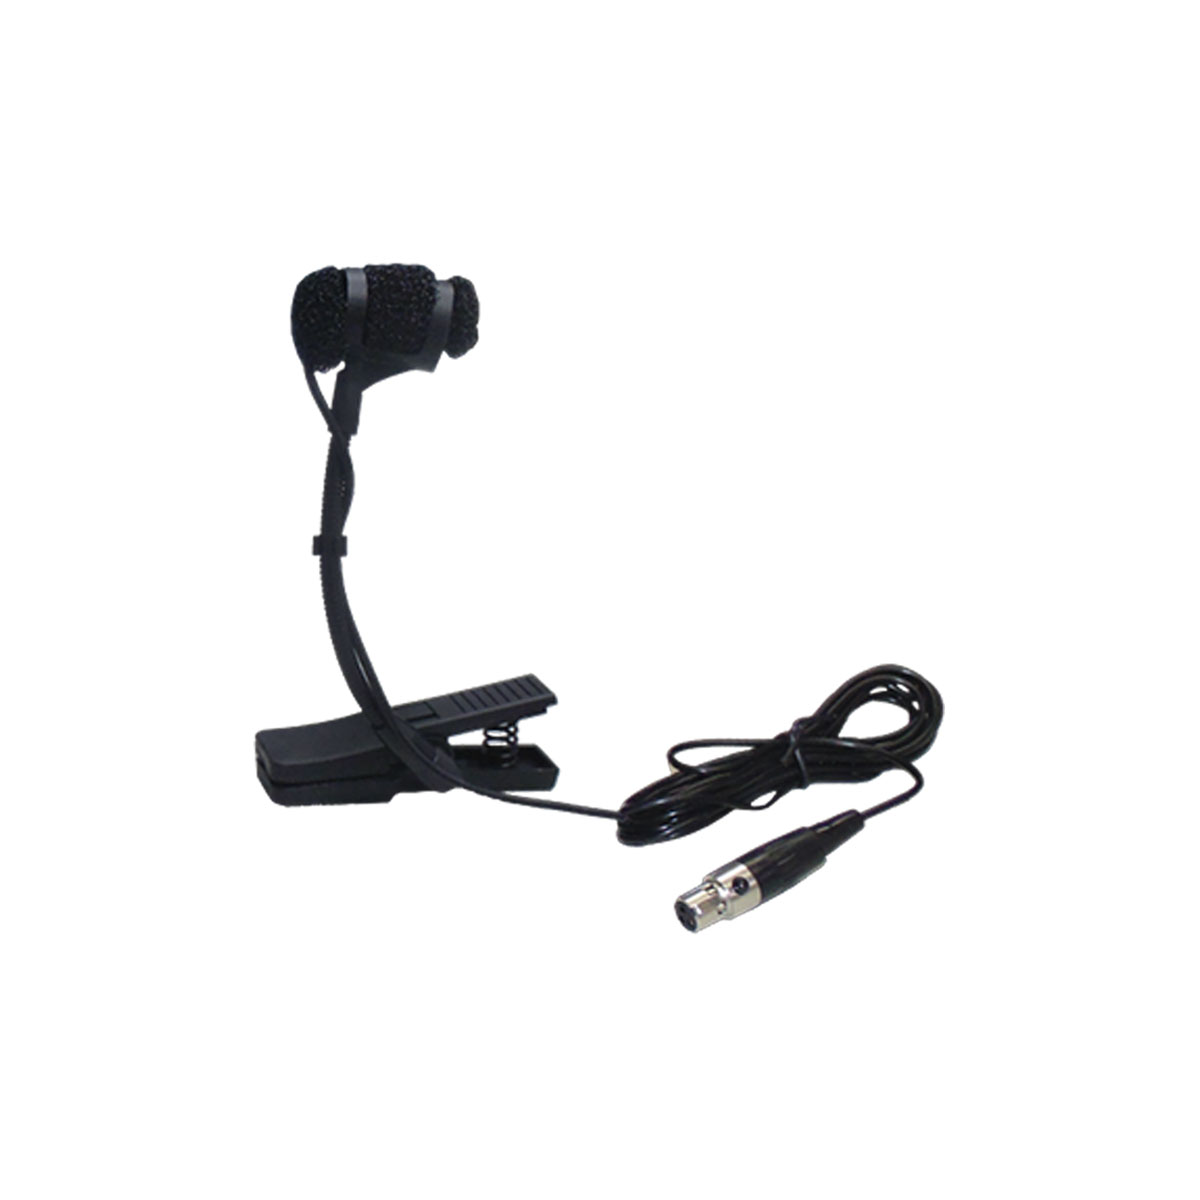 Microfone c/ Fio p/ Trompete / Sax - IM 03 MX Lyco